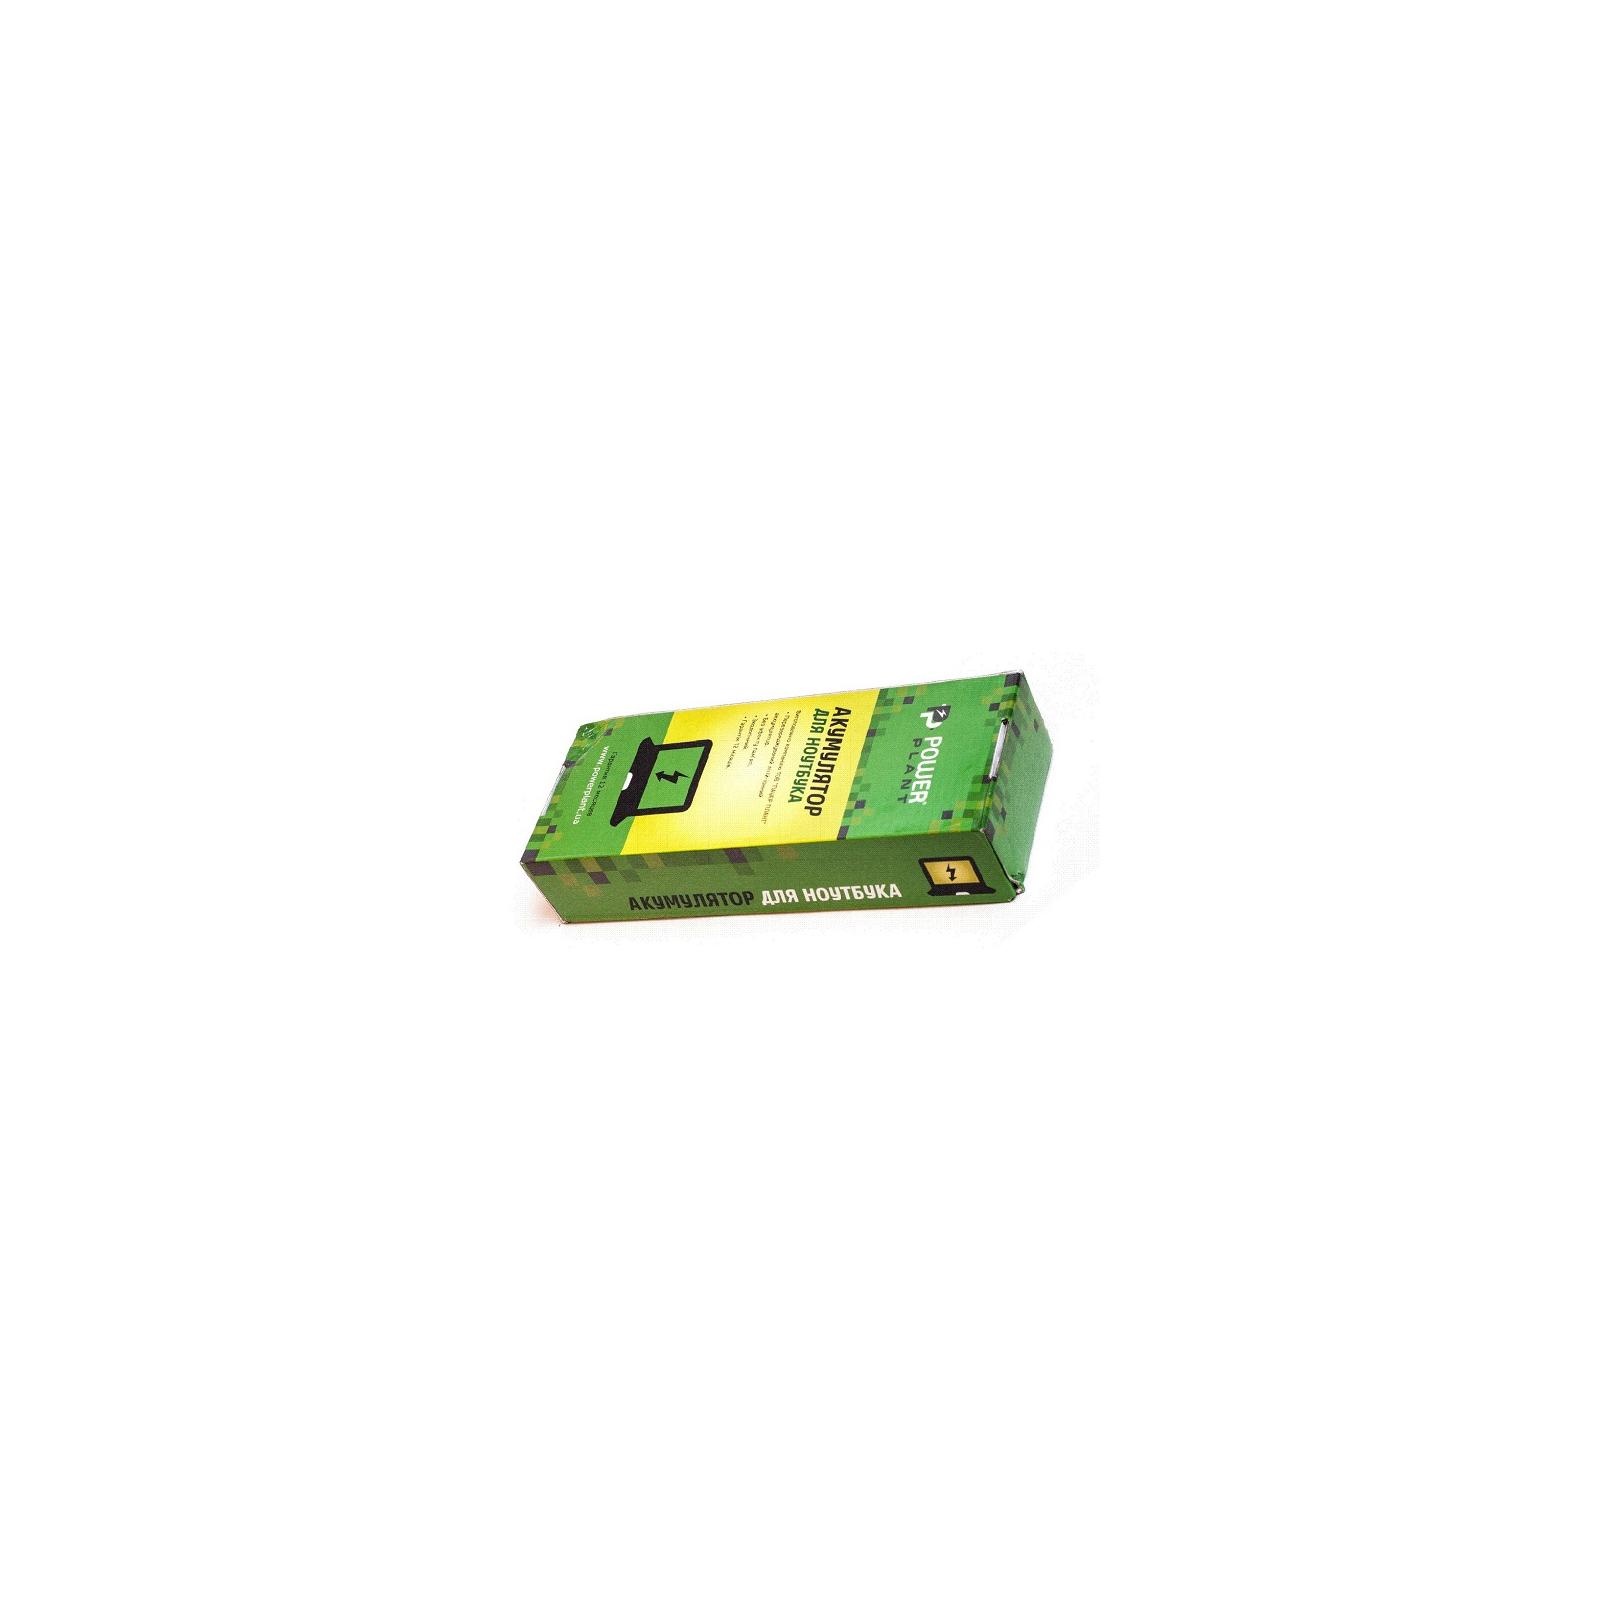 Аккумулятор для ноутбука CASPER TW8 Series (SQU-804, UN8040LH) 11.1V 5200mAh PowerPlant (NB00000144) изображение 3